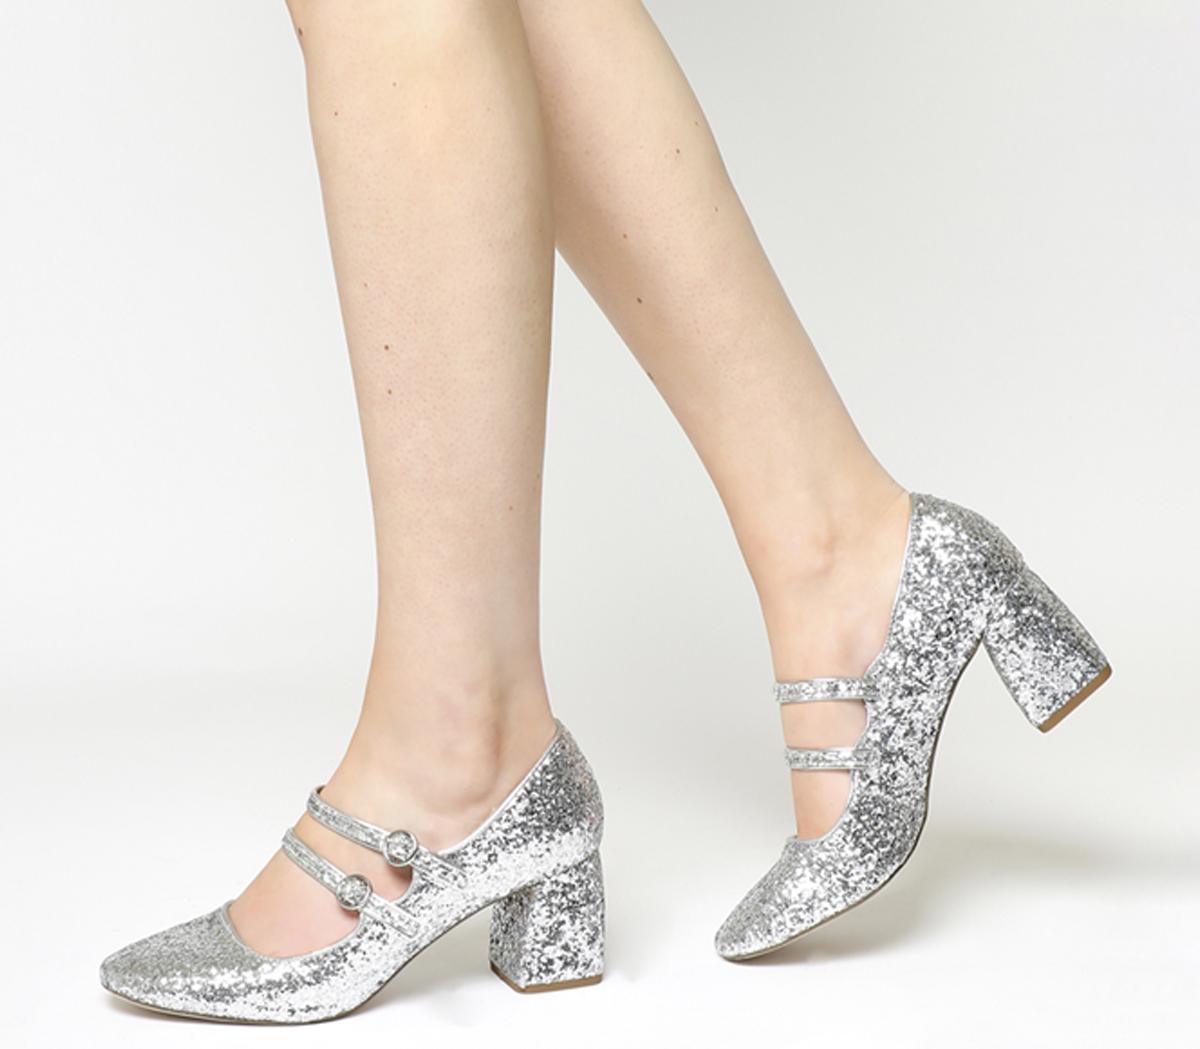 Milly Glitter Mary Jane